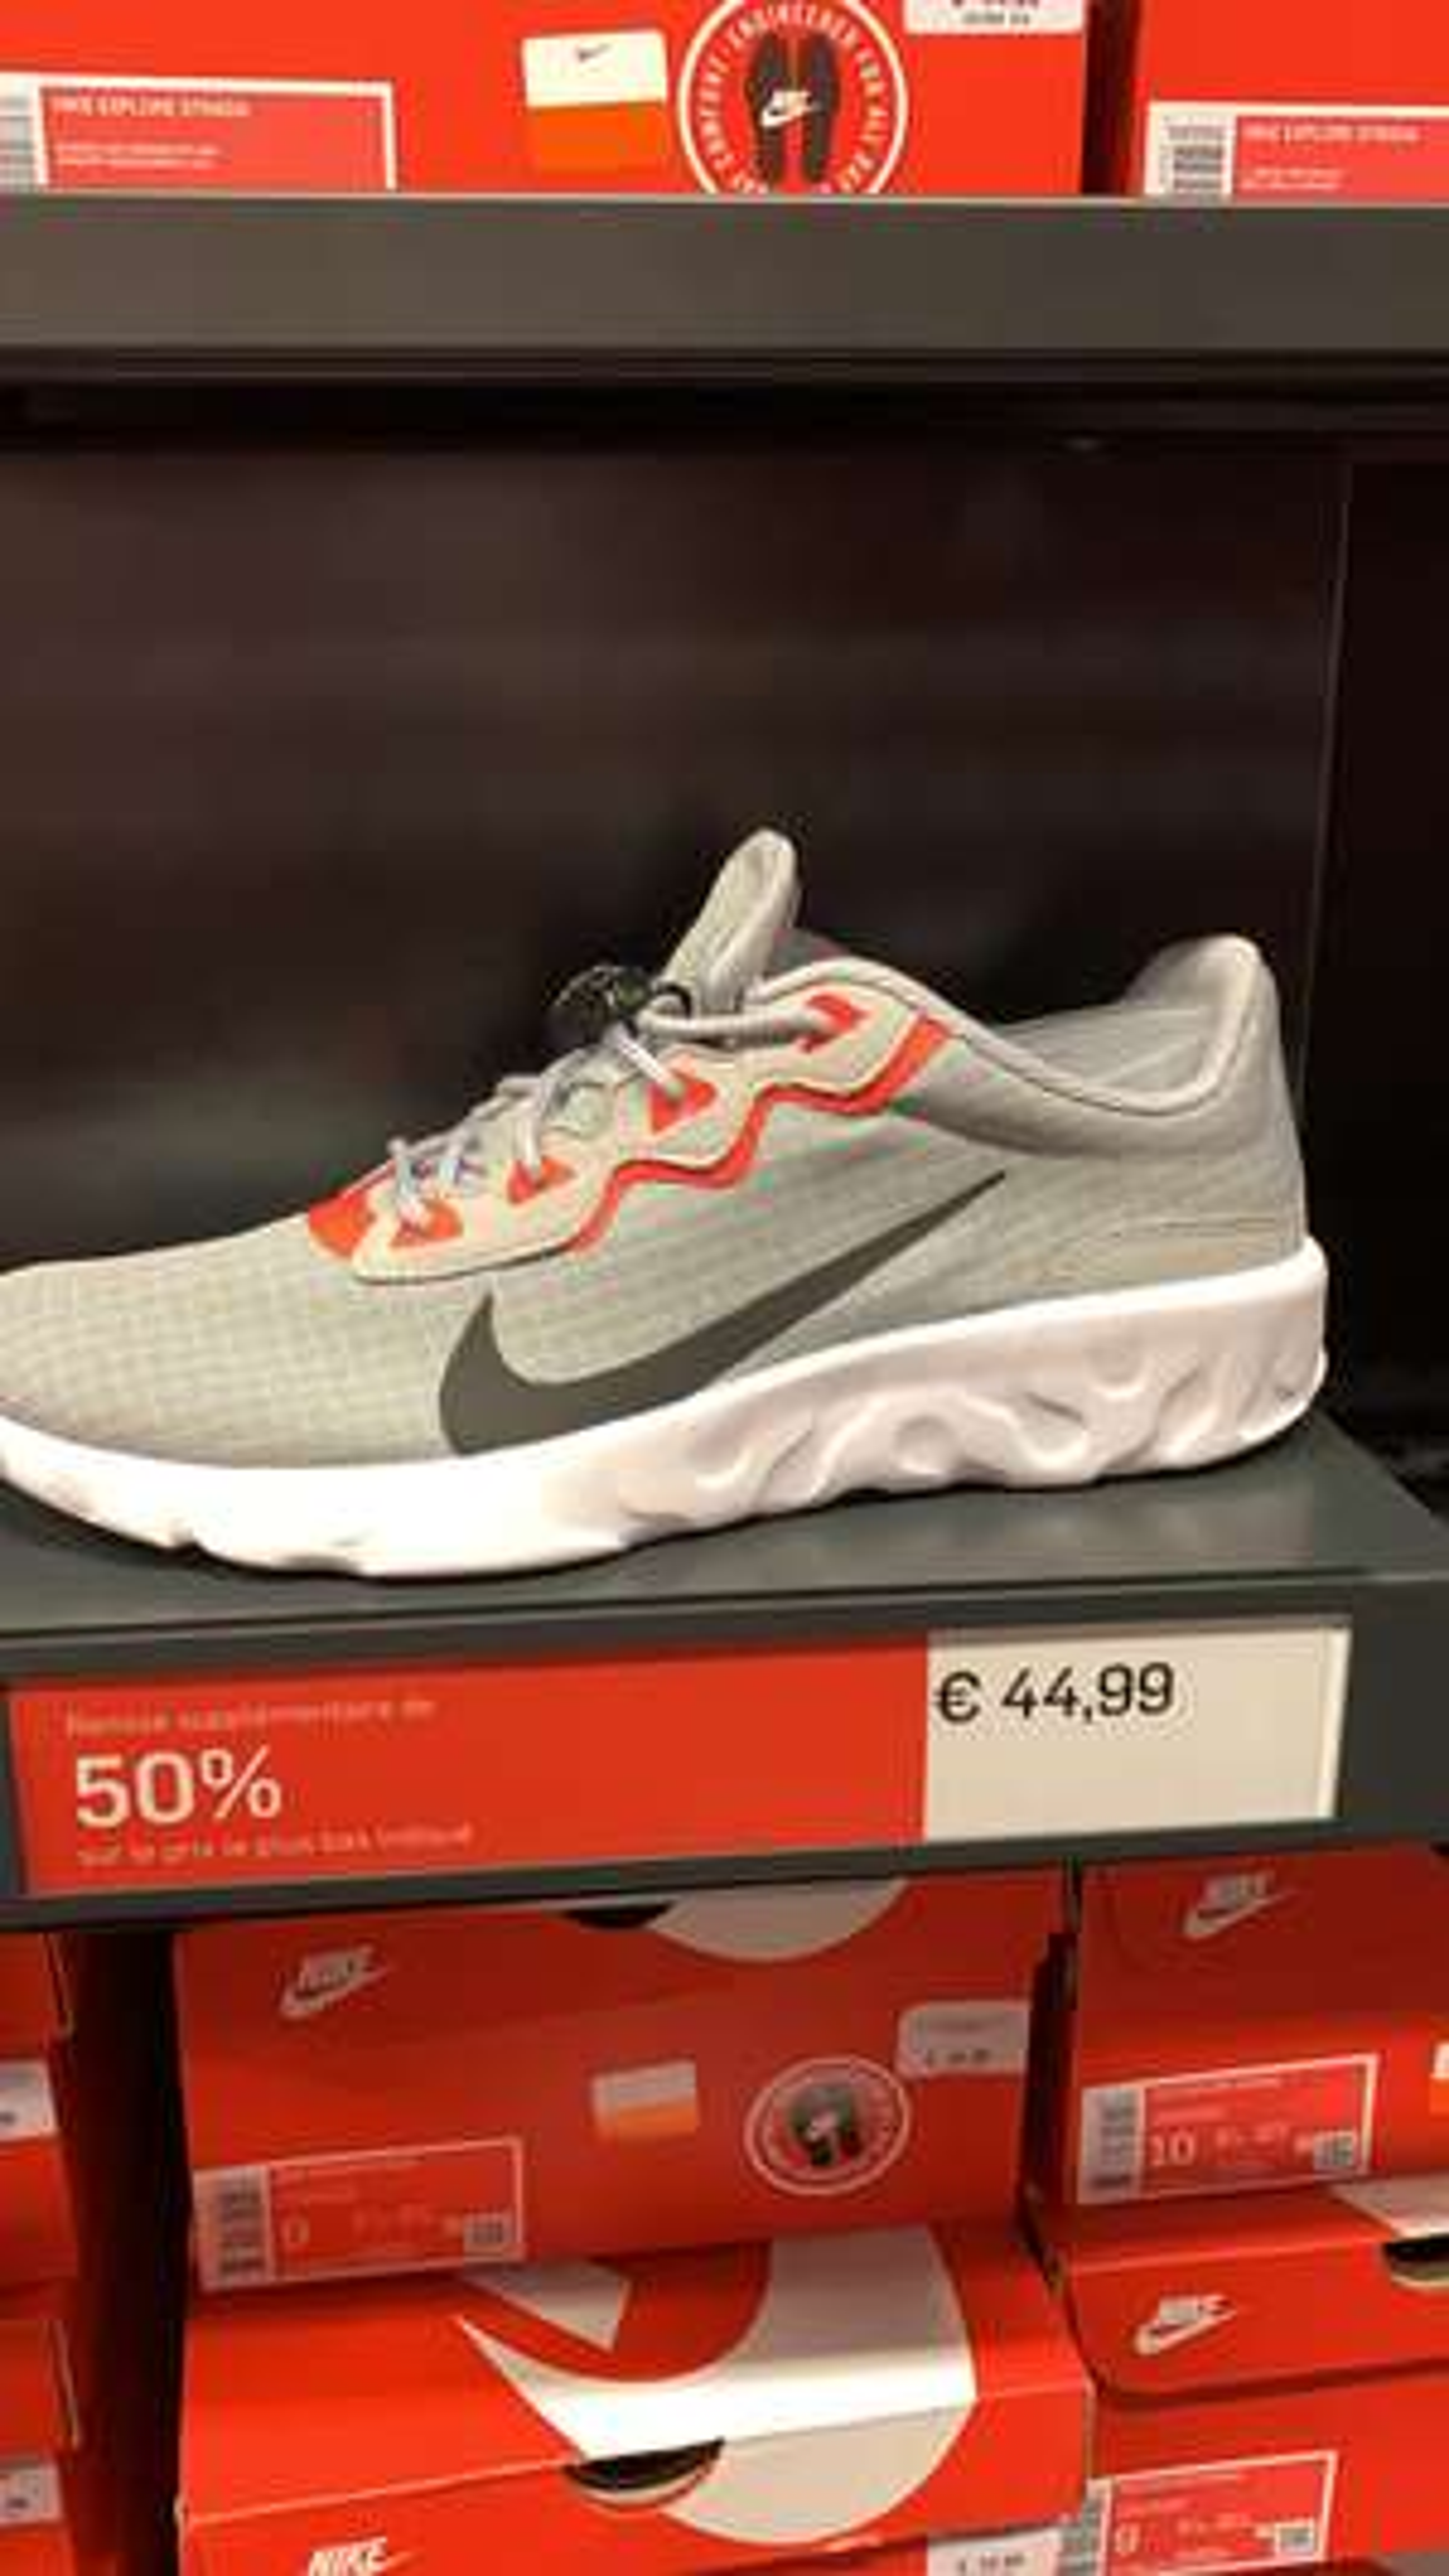 Baskets Nike Explore Strada - Gonesse (95)